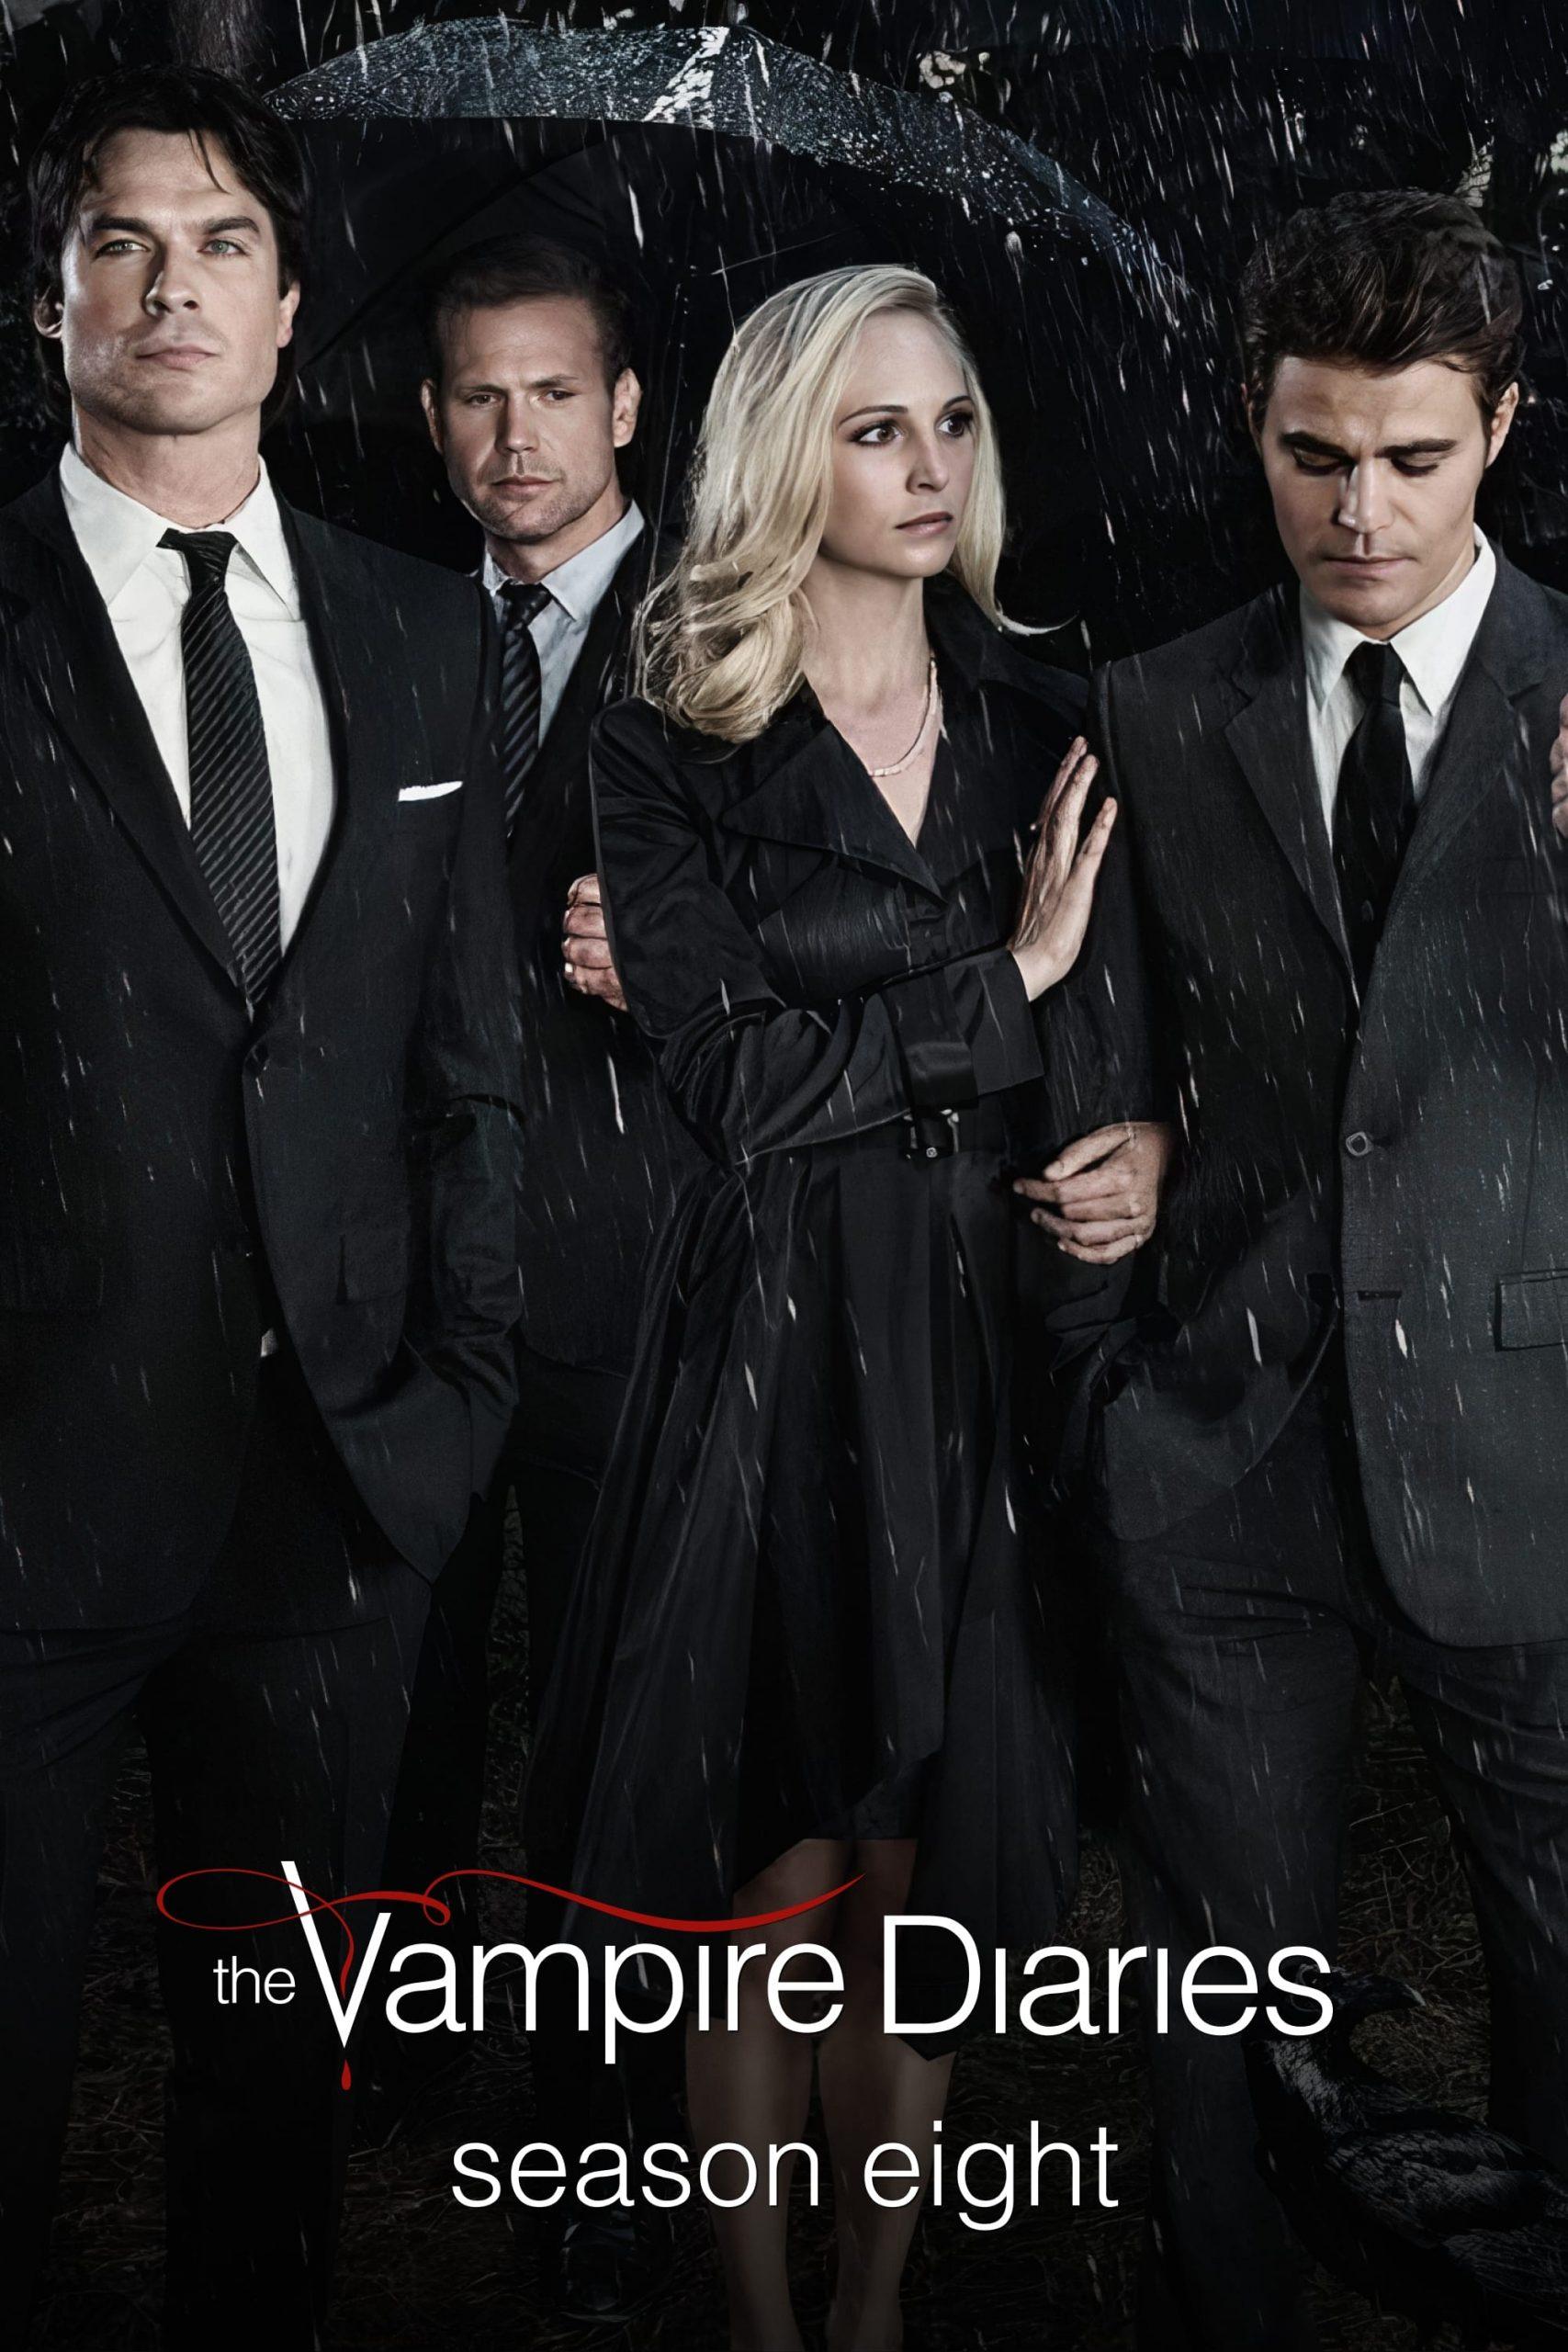 The Vampire Diaries บันทึกรักเทพบุตรแวมไพร์ Season 8 ซับไทย ตอนที่ 1-16